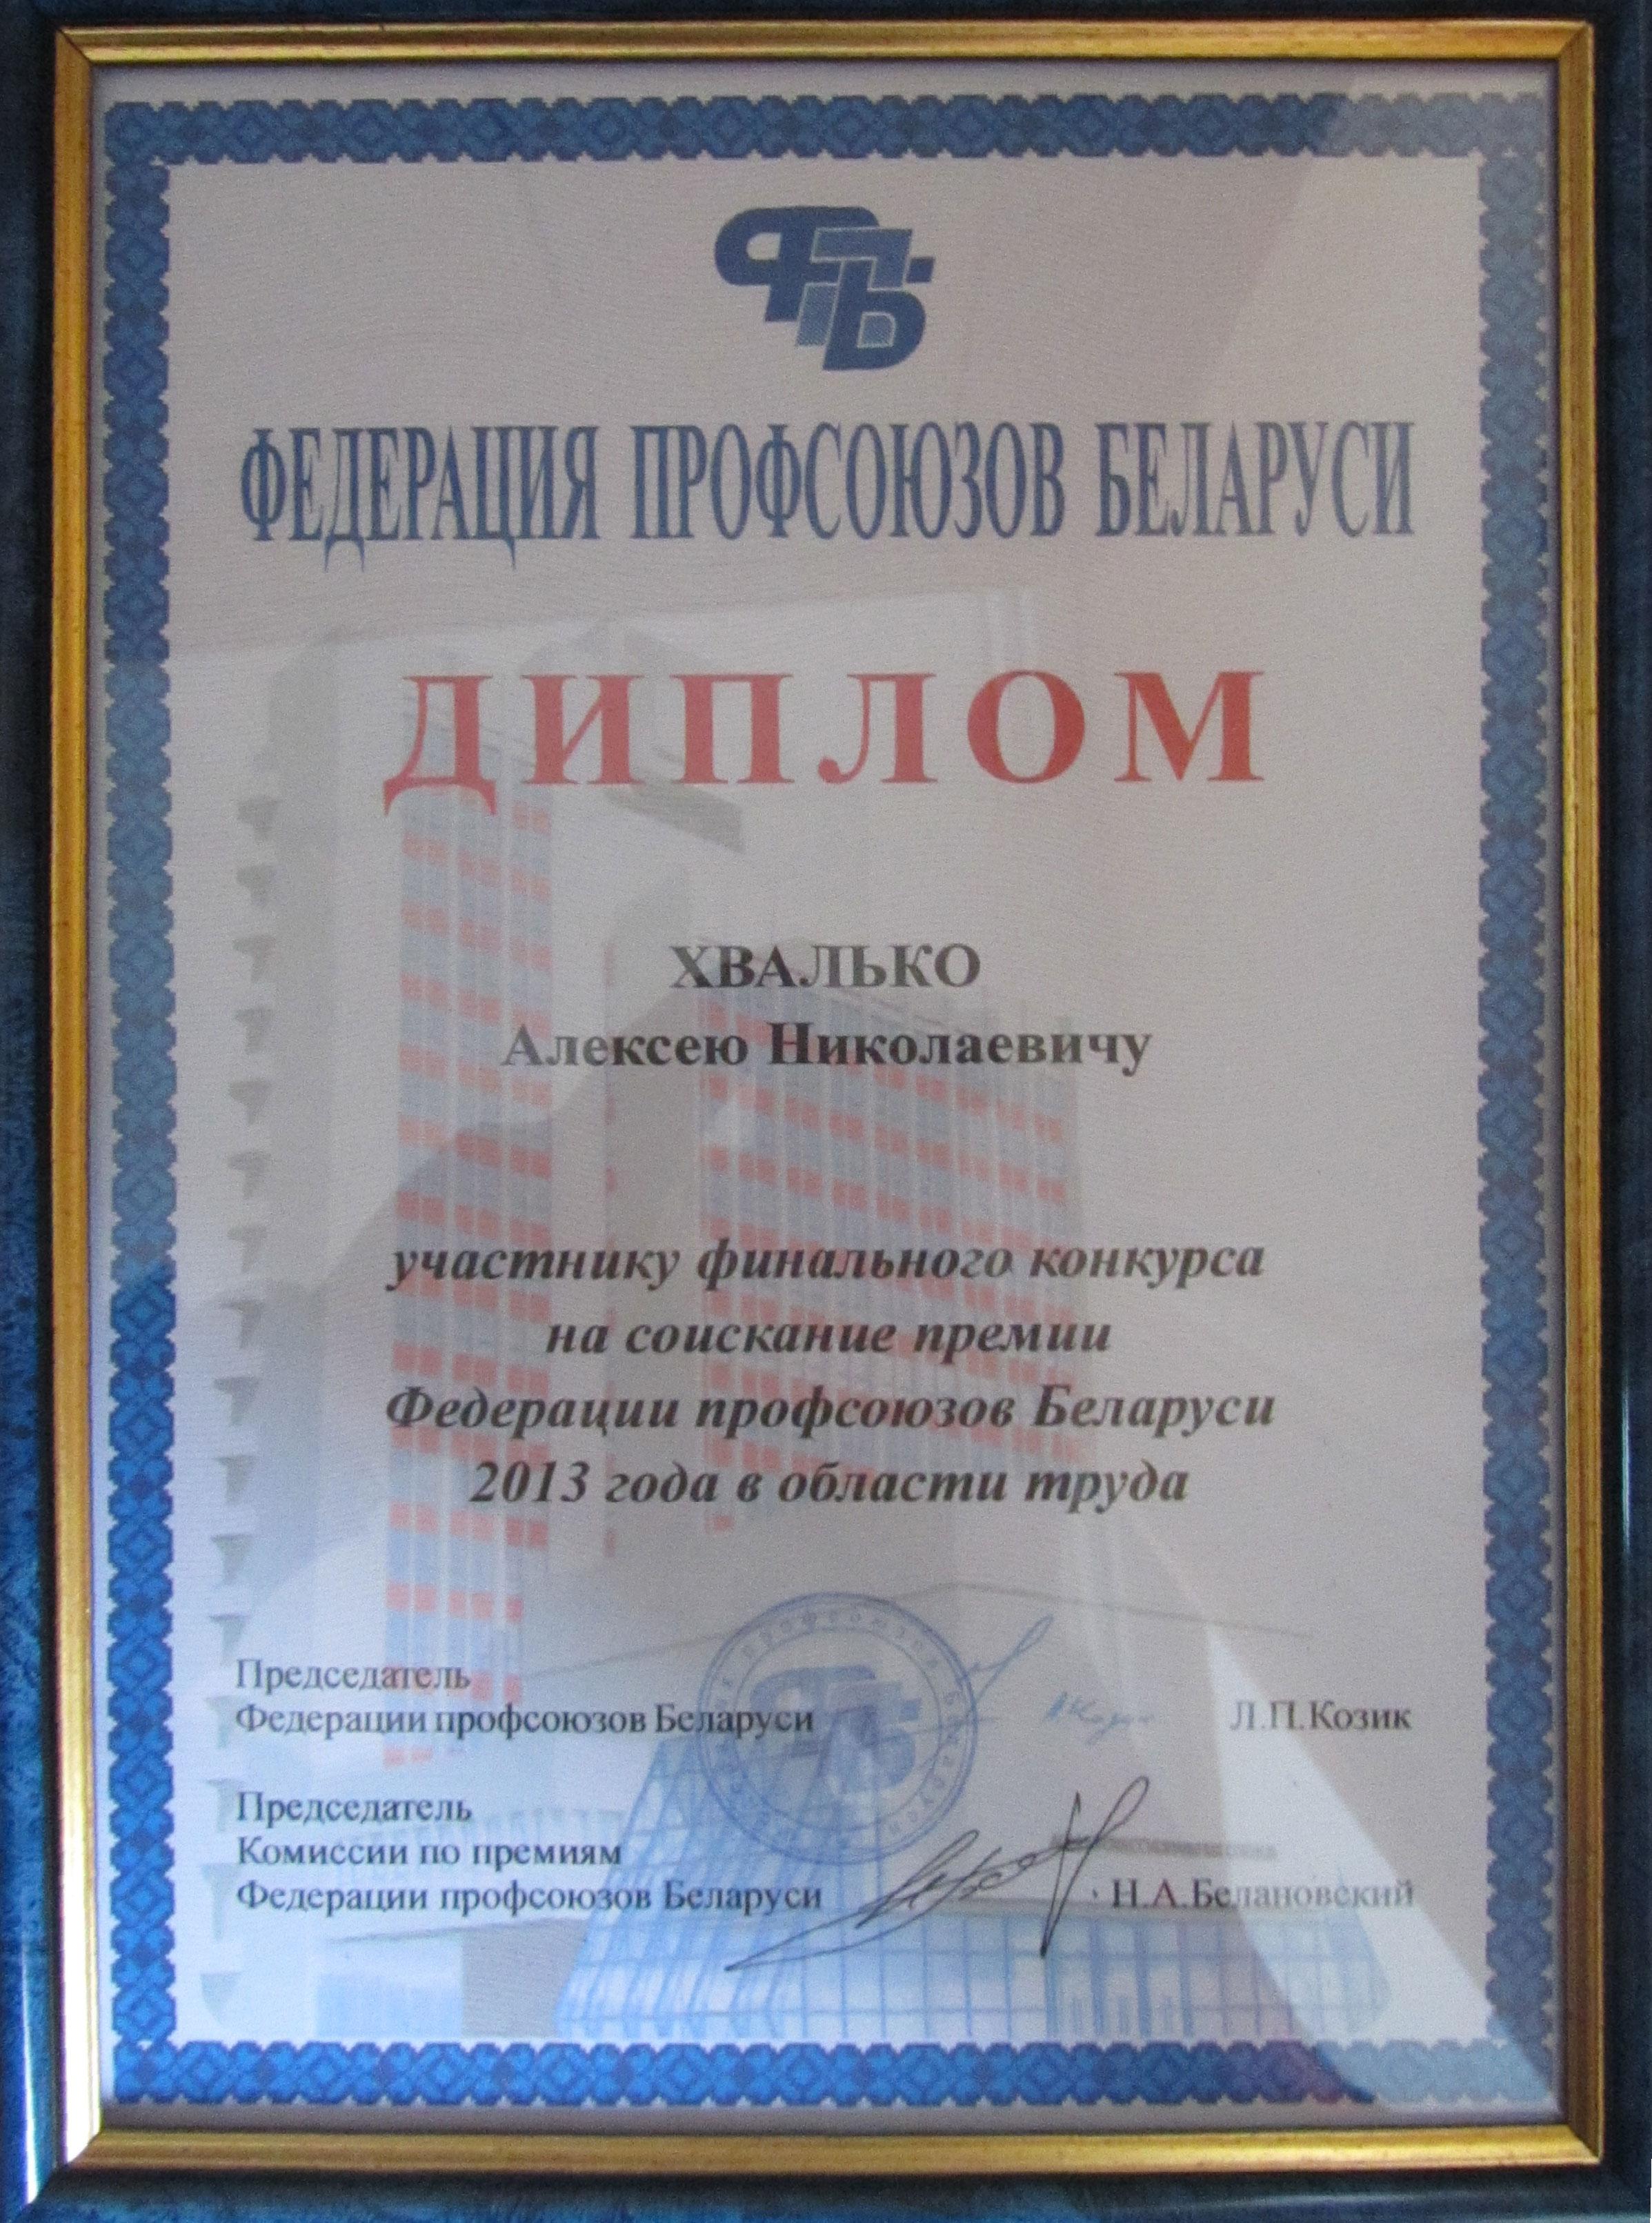 nagrada-6